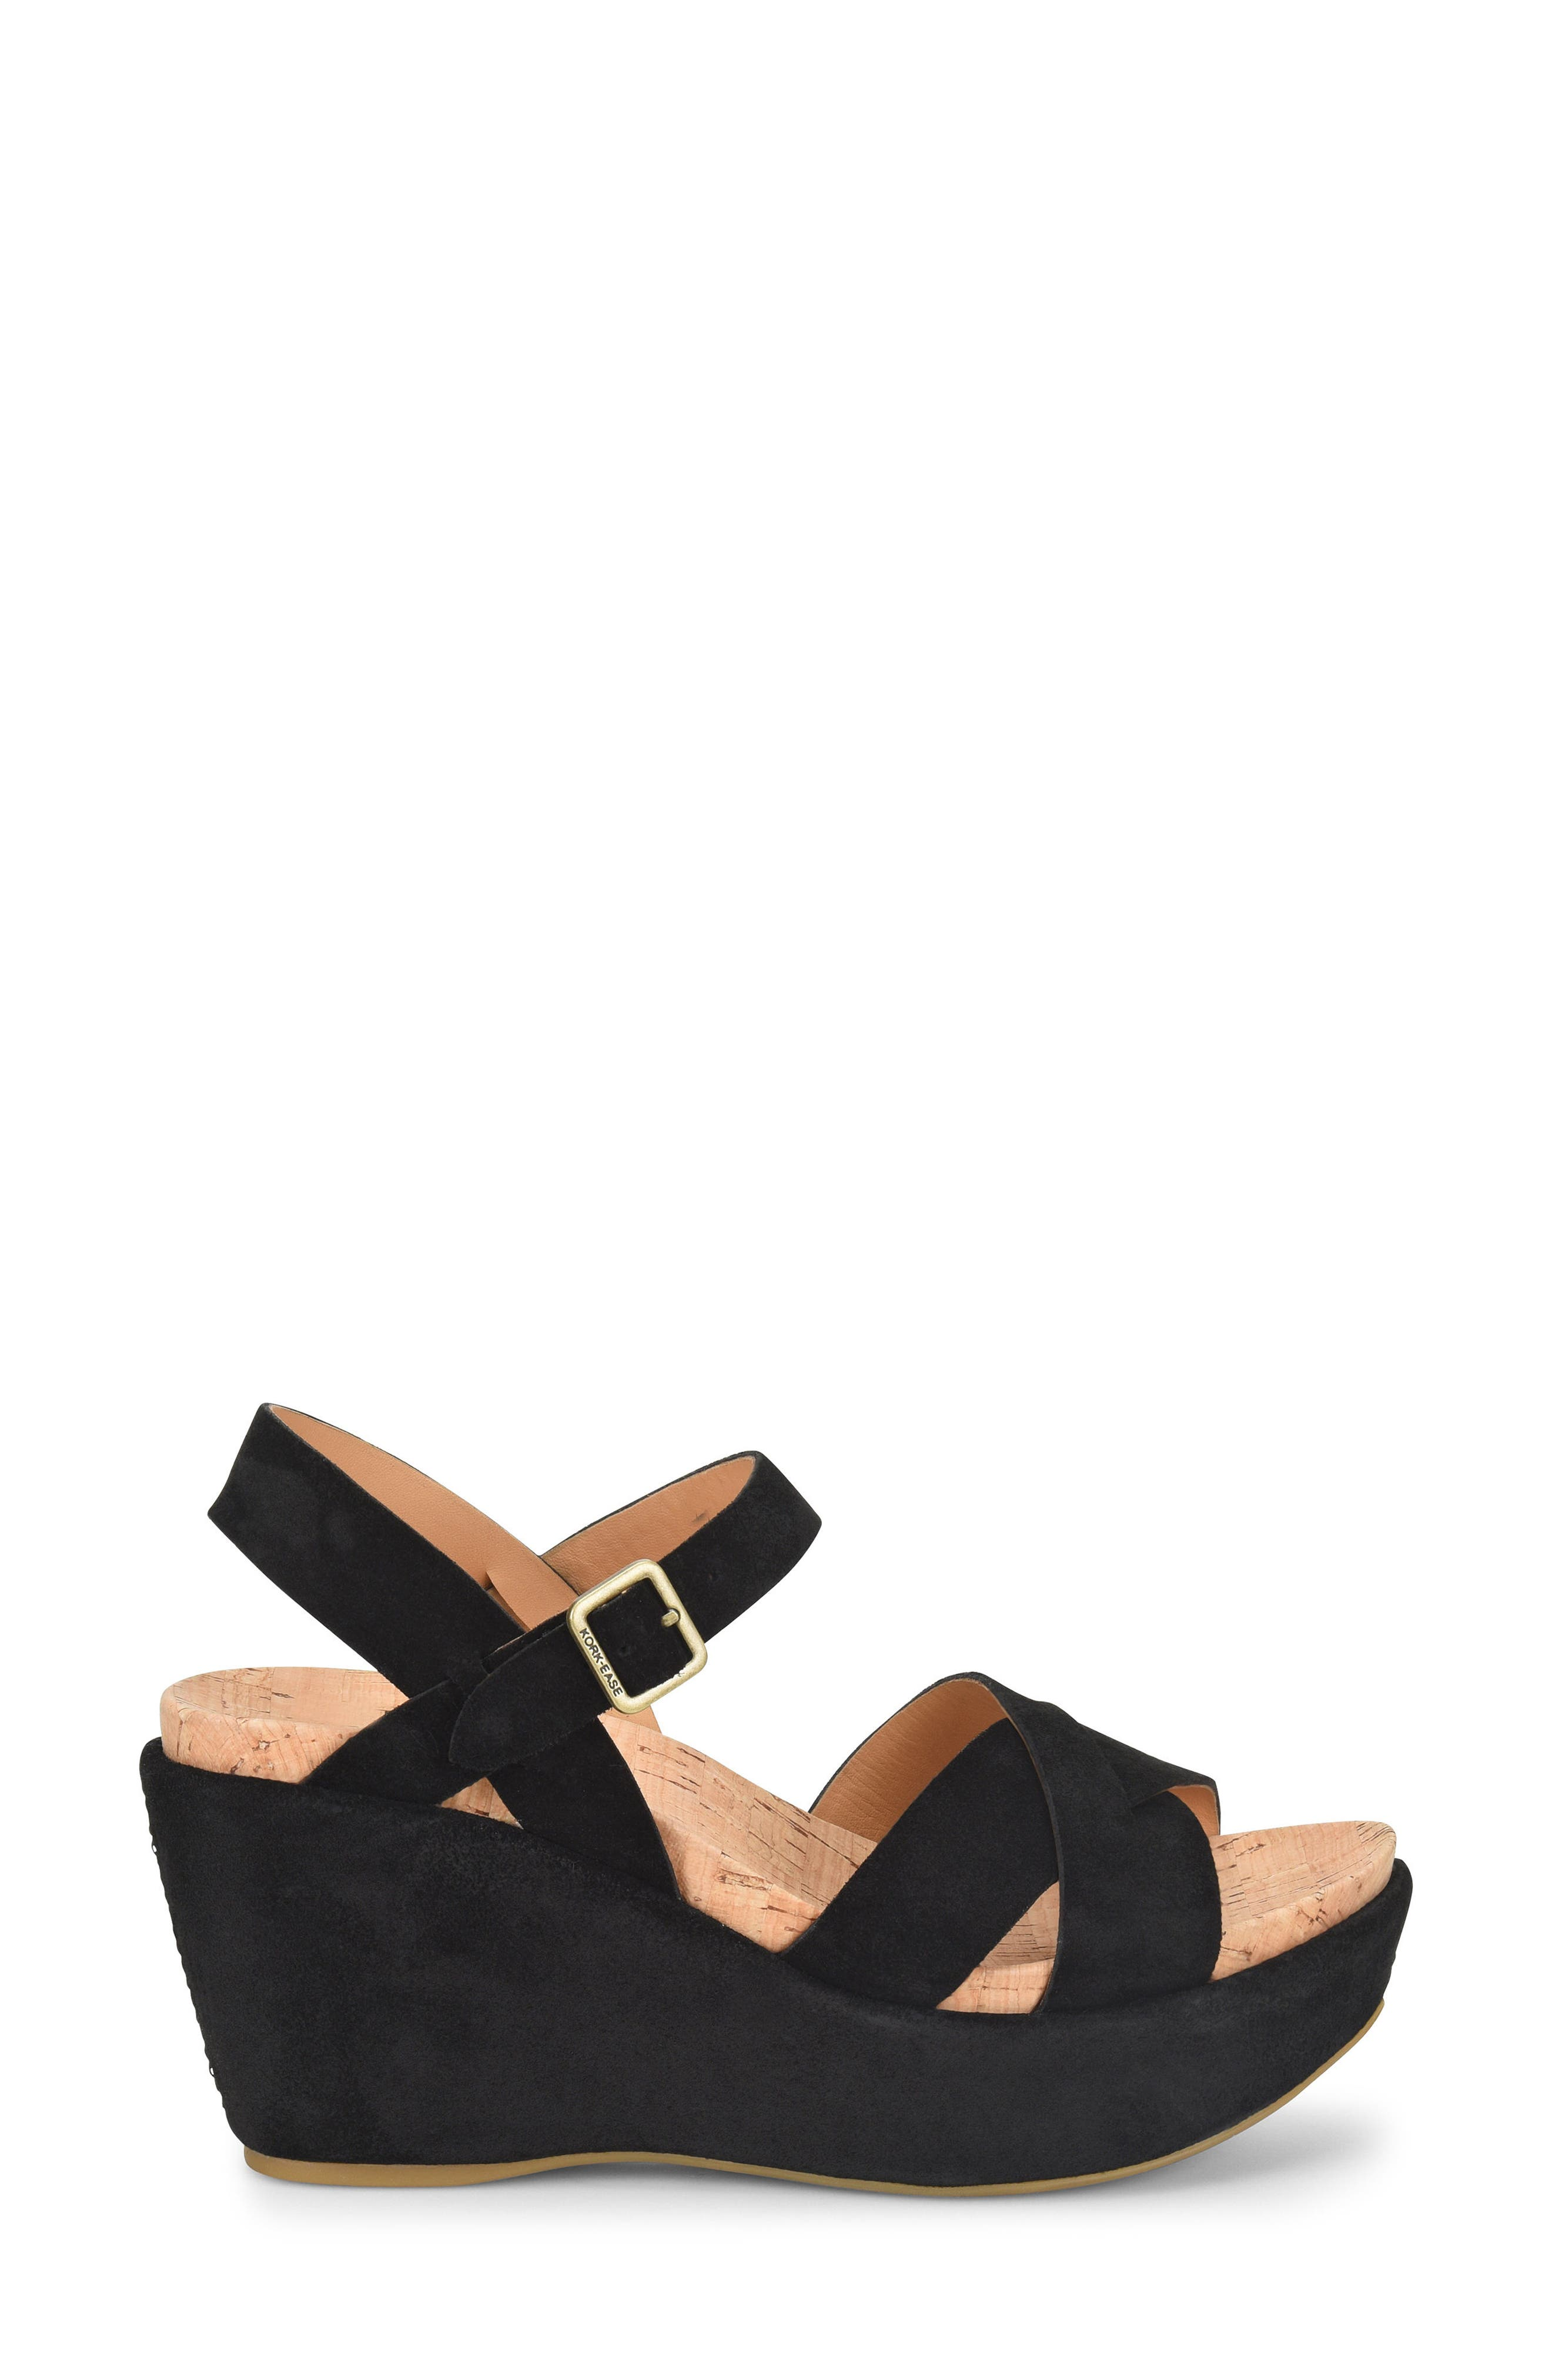 'Ava 2.0' Platform Wedge Sandal,                             Alternate thumbnail 3, color,                             BLACK SUEDE 2